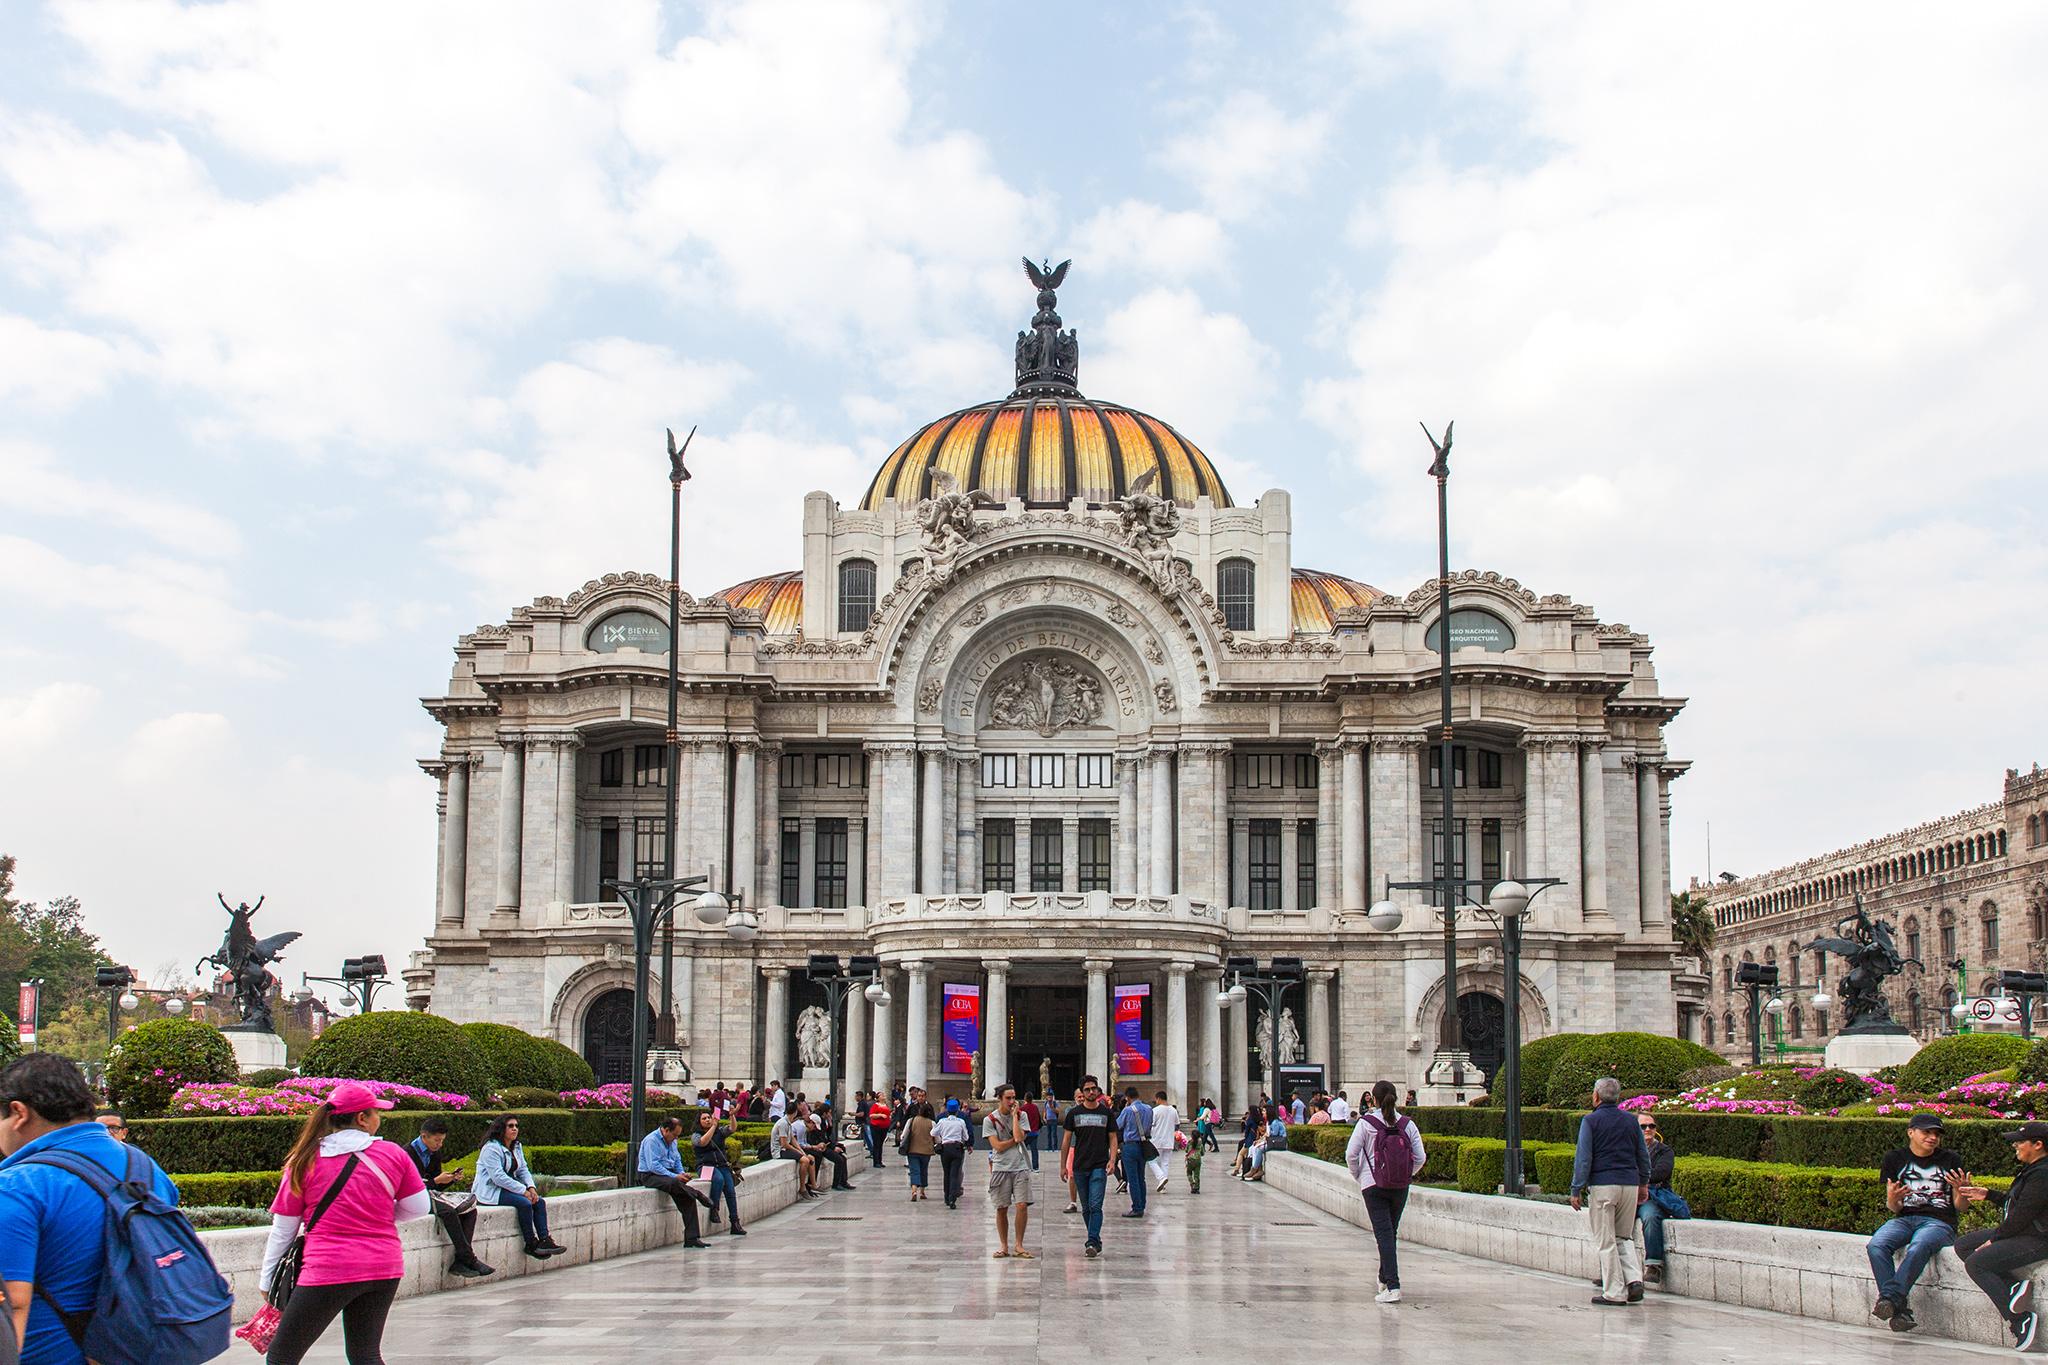 Palacio de Bellas Artes, sadly closed on Mondays. Next time!